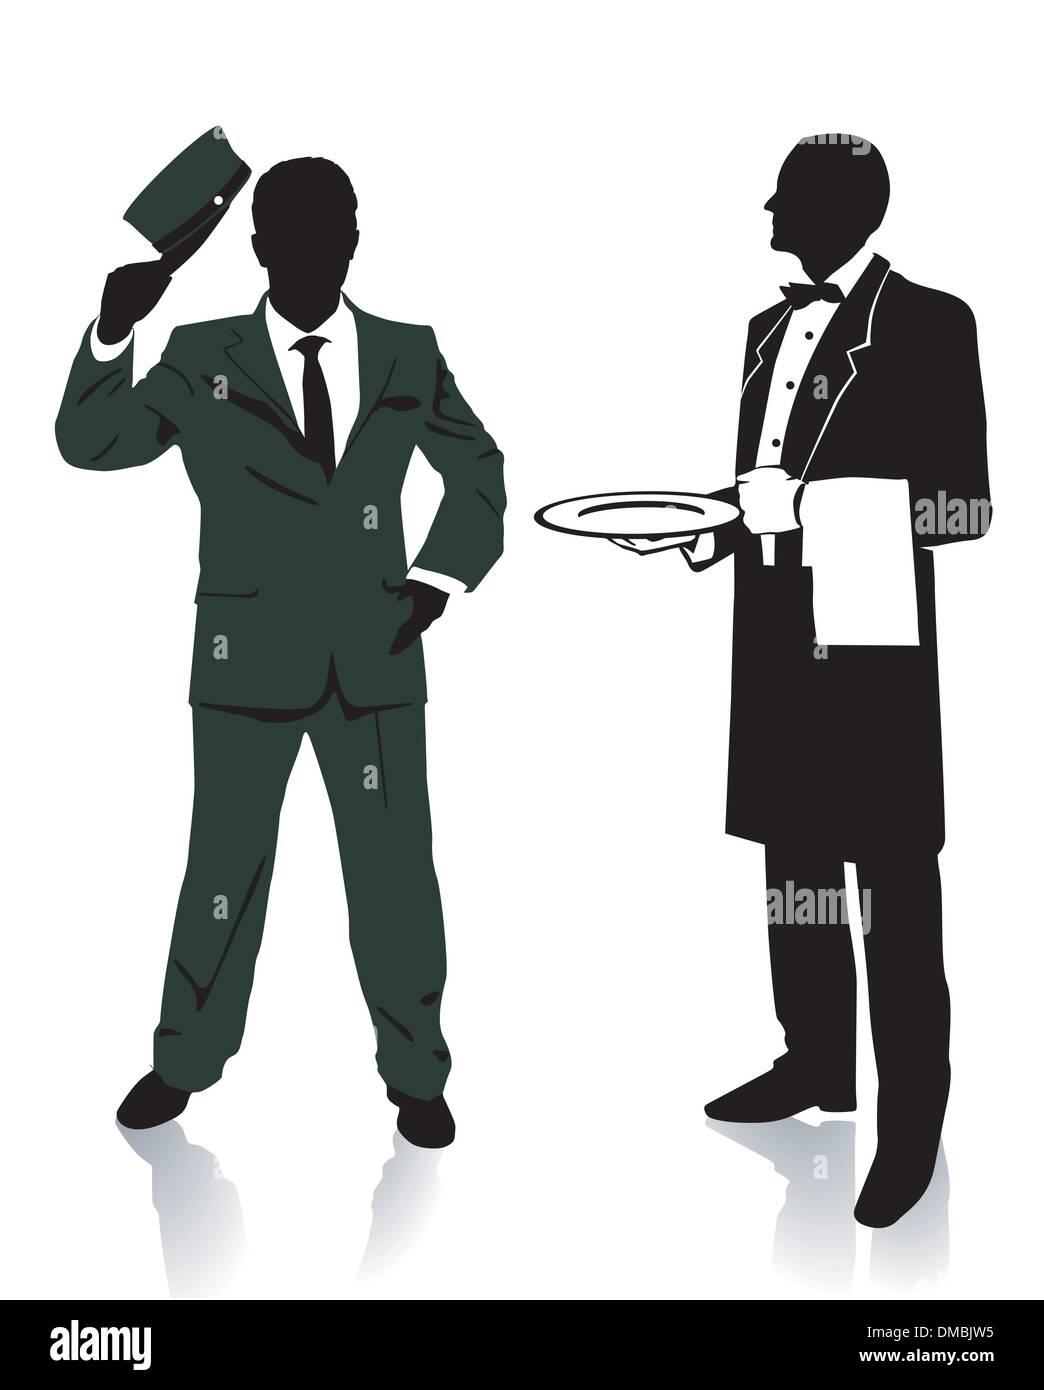 Waiter and porter - Stock Image